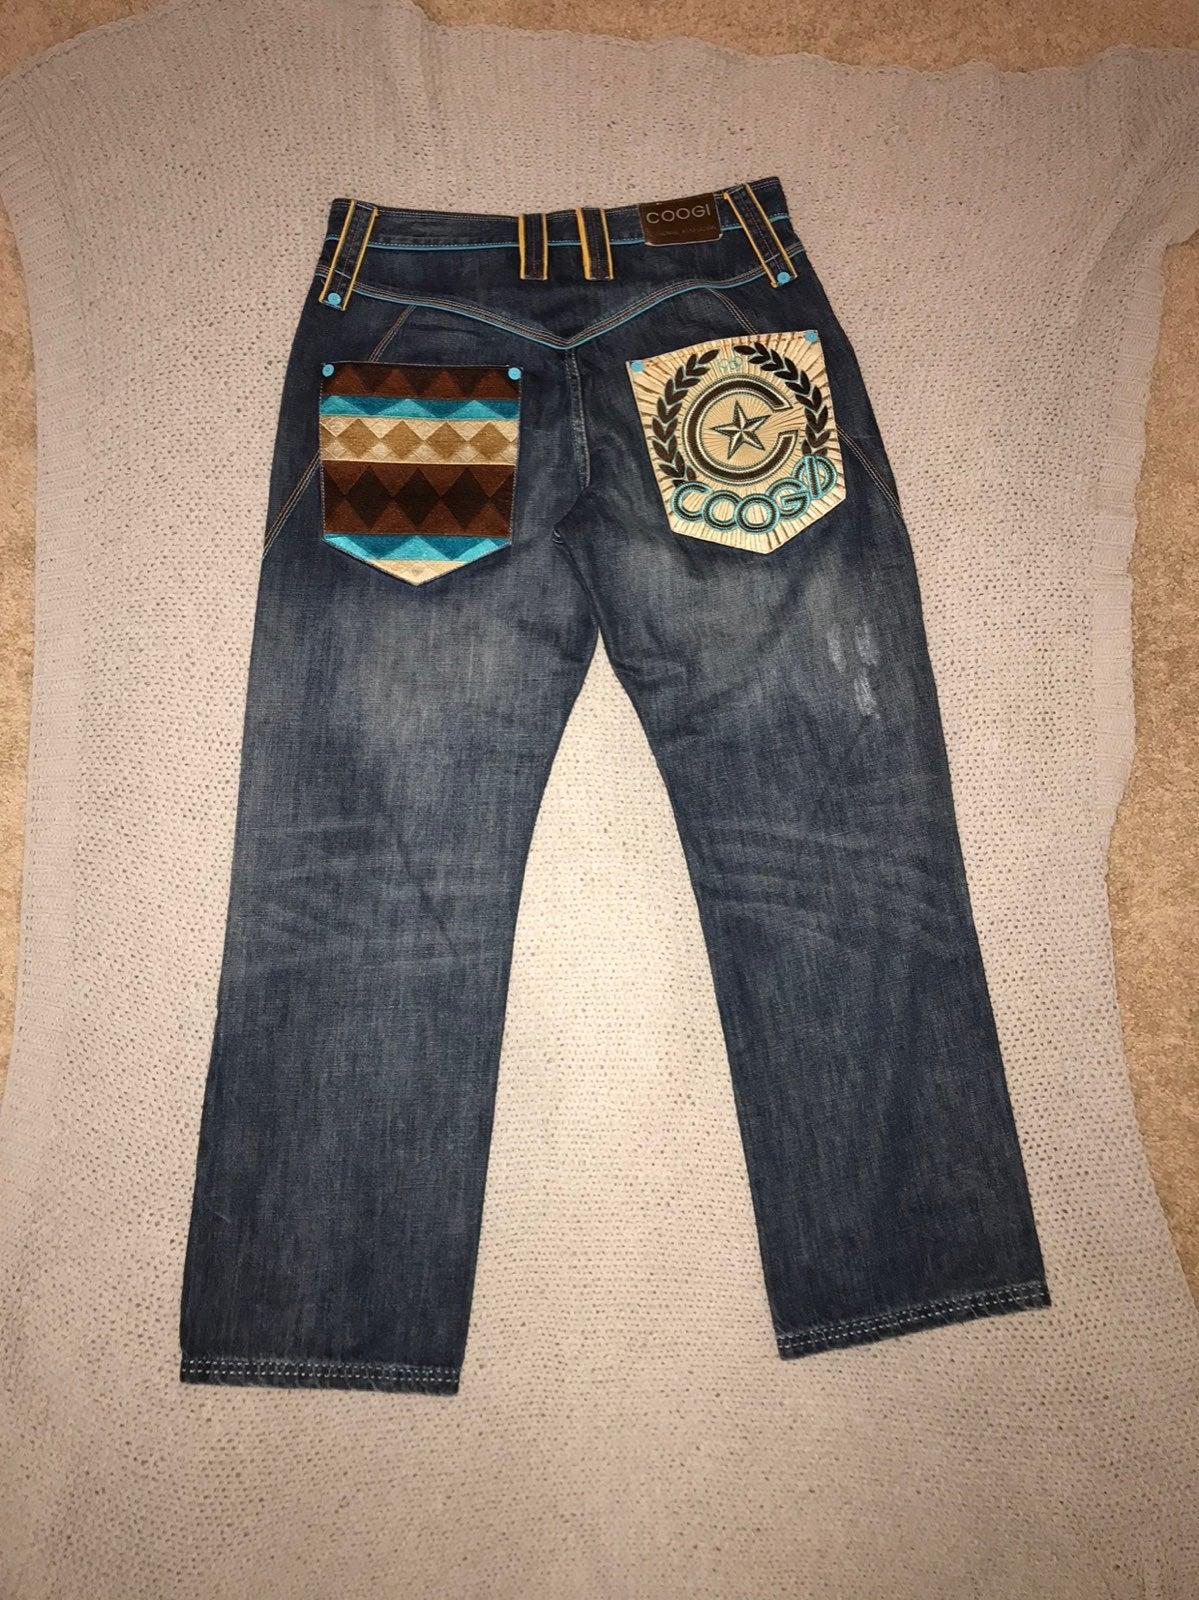 Coogi Jeans. Excellent condition